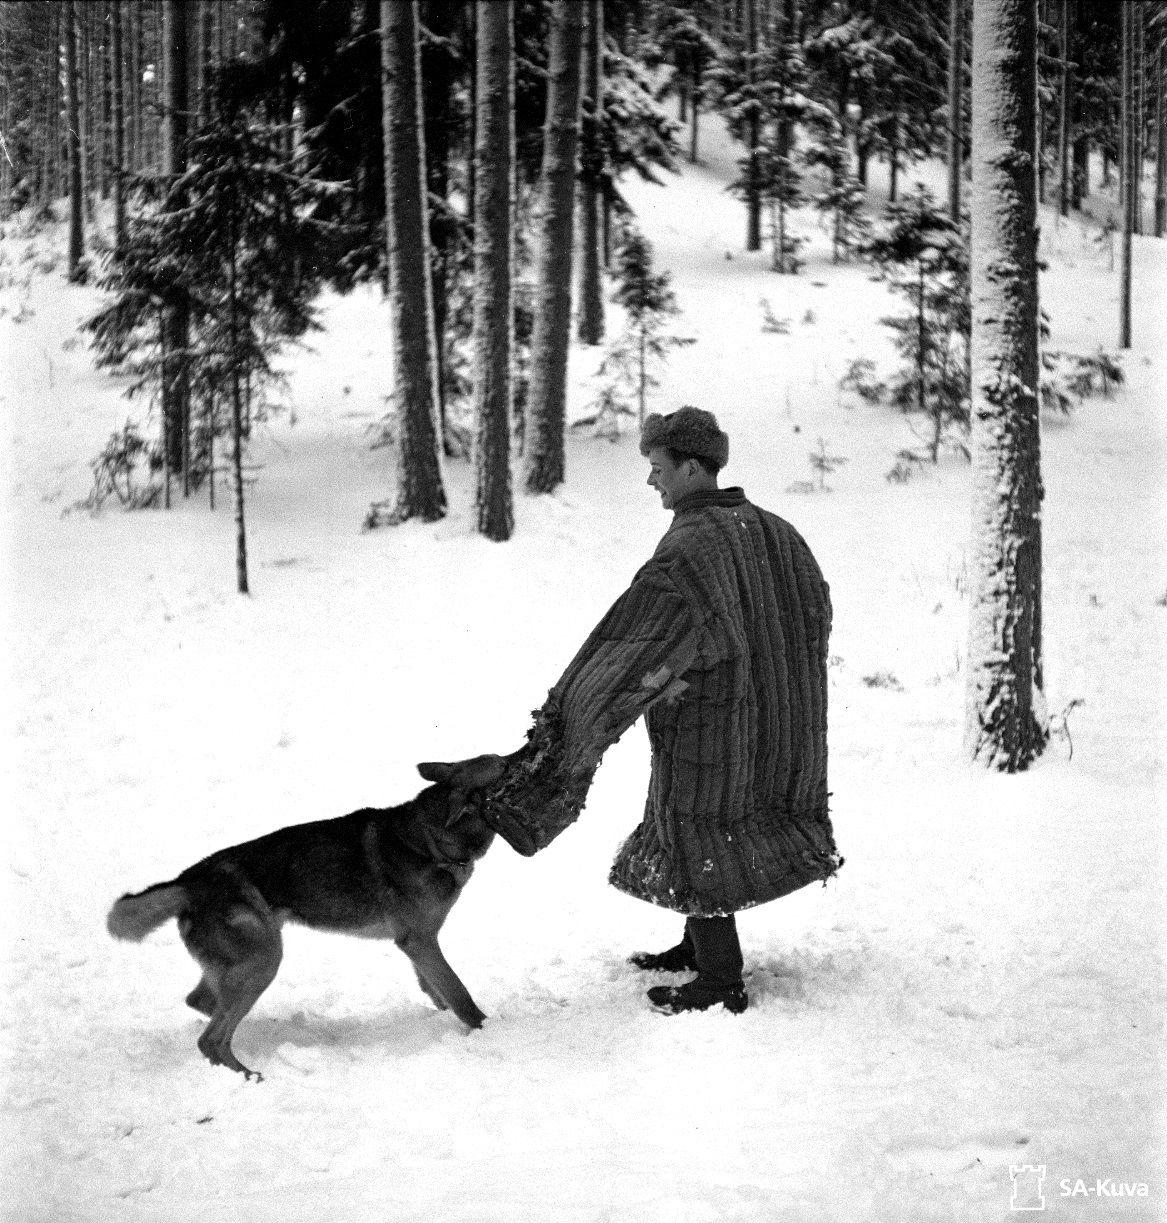 A Finnish Dog Trainer At The Hameenlinna War Dog School Instructs